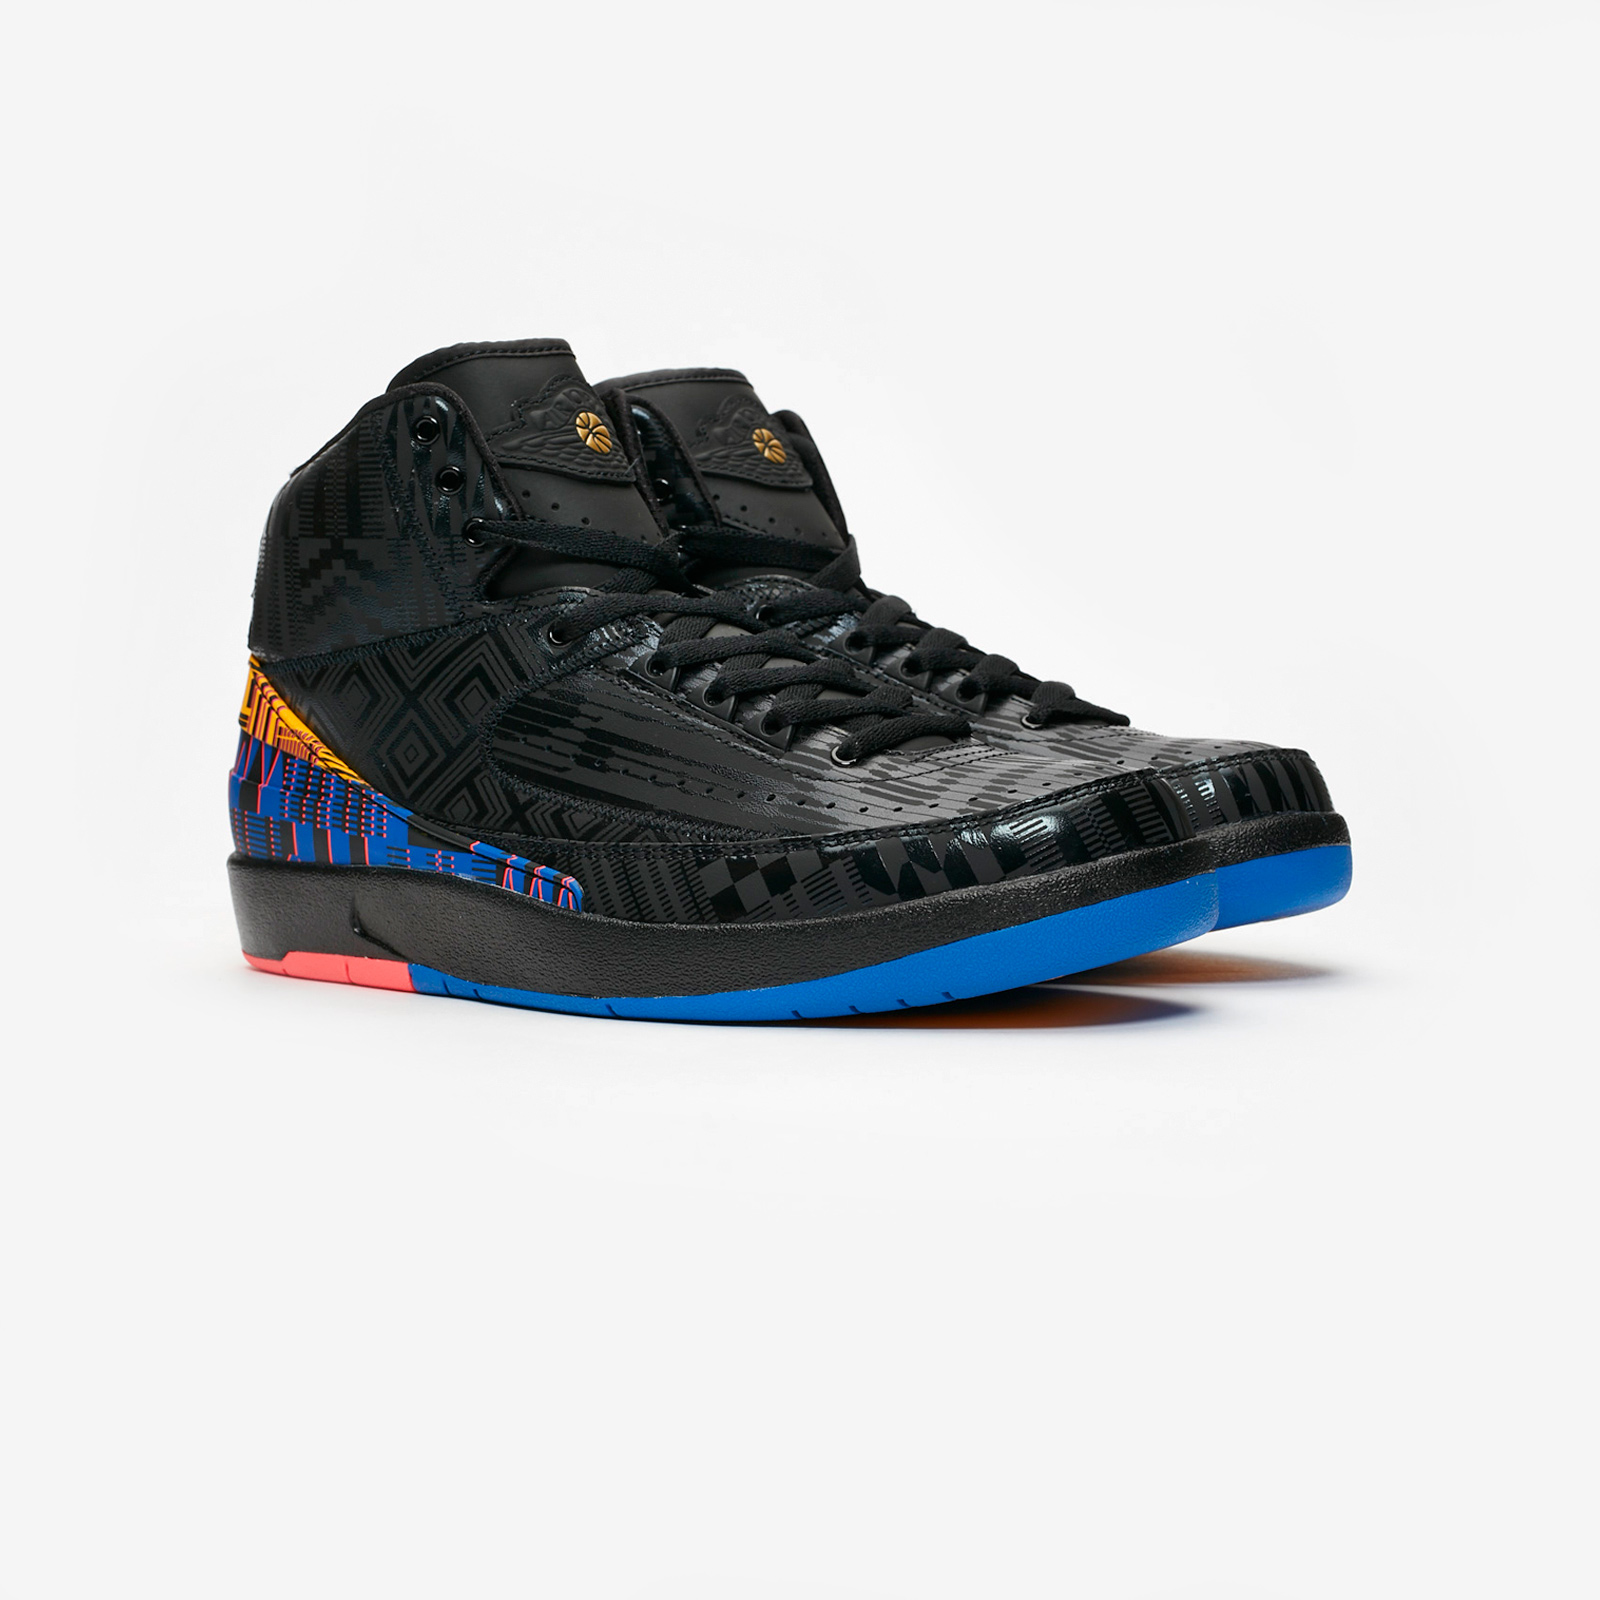 90d44c8ece04e0 Jordan Brand Air Jordan 2 Retro BHM - Bq7618-007 - Sneakersnstuff ...